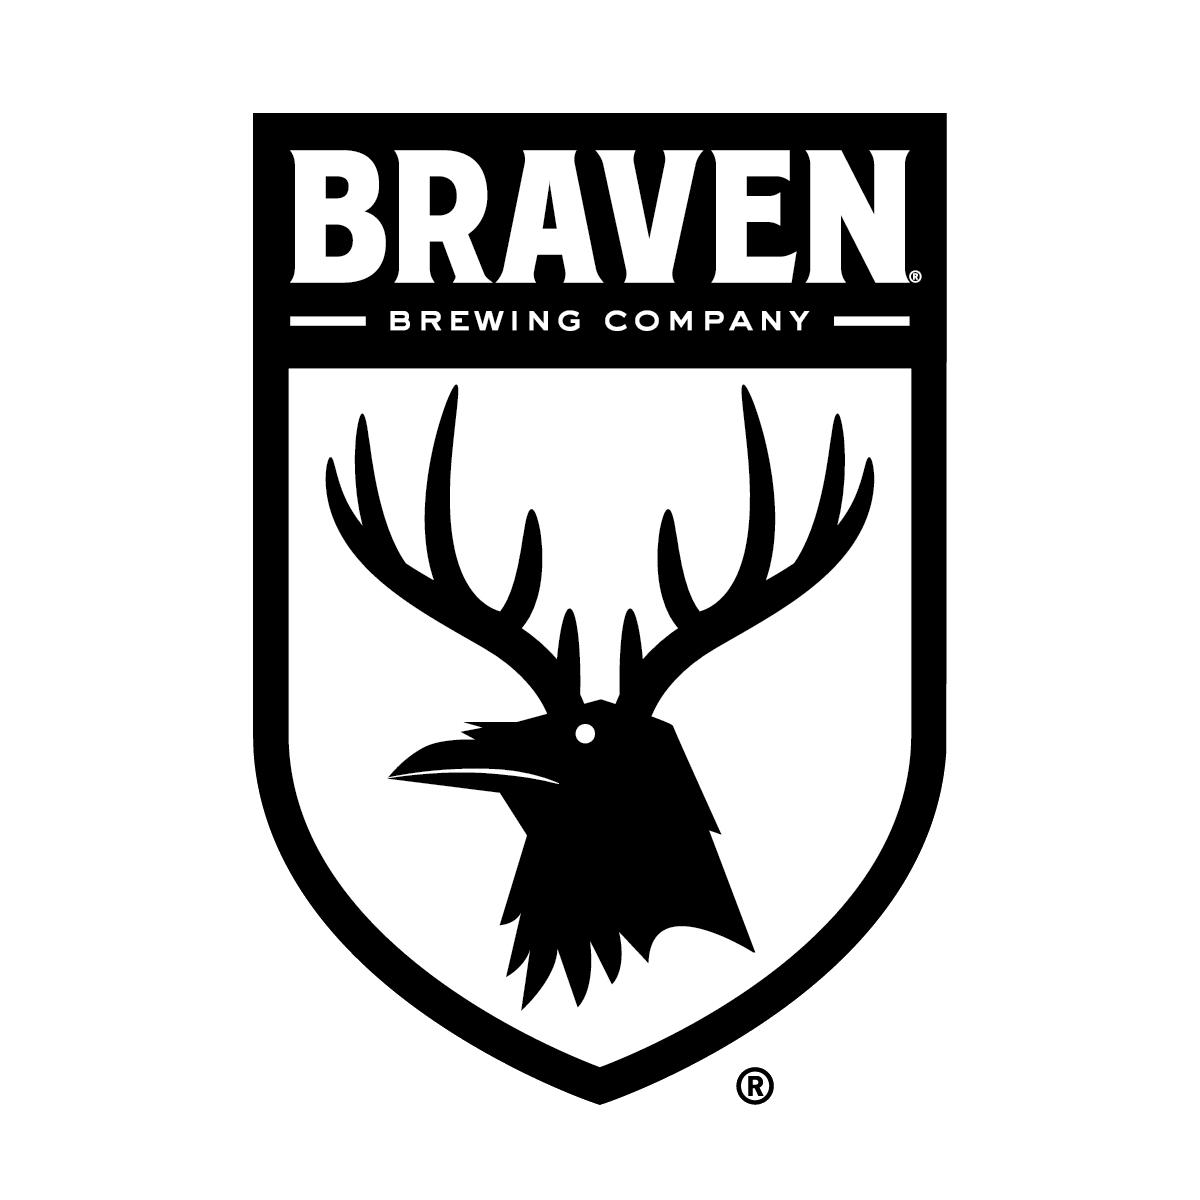 Braven.png